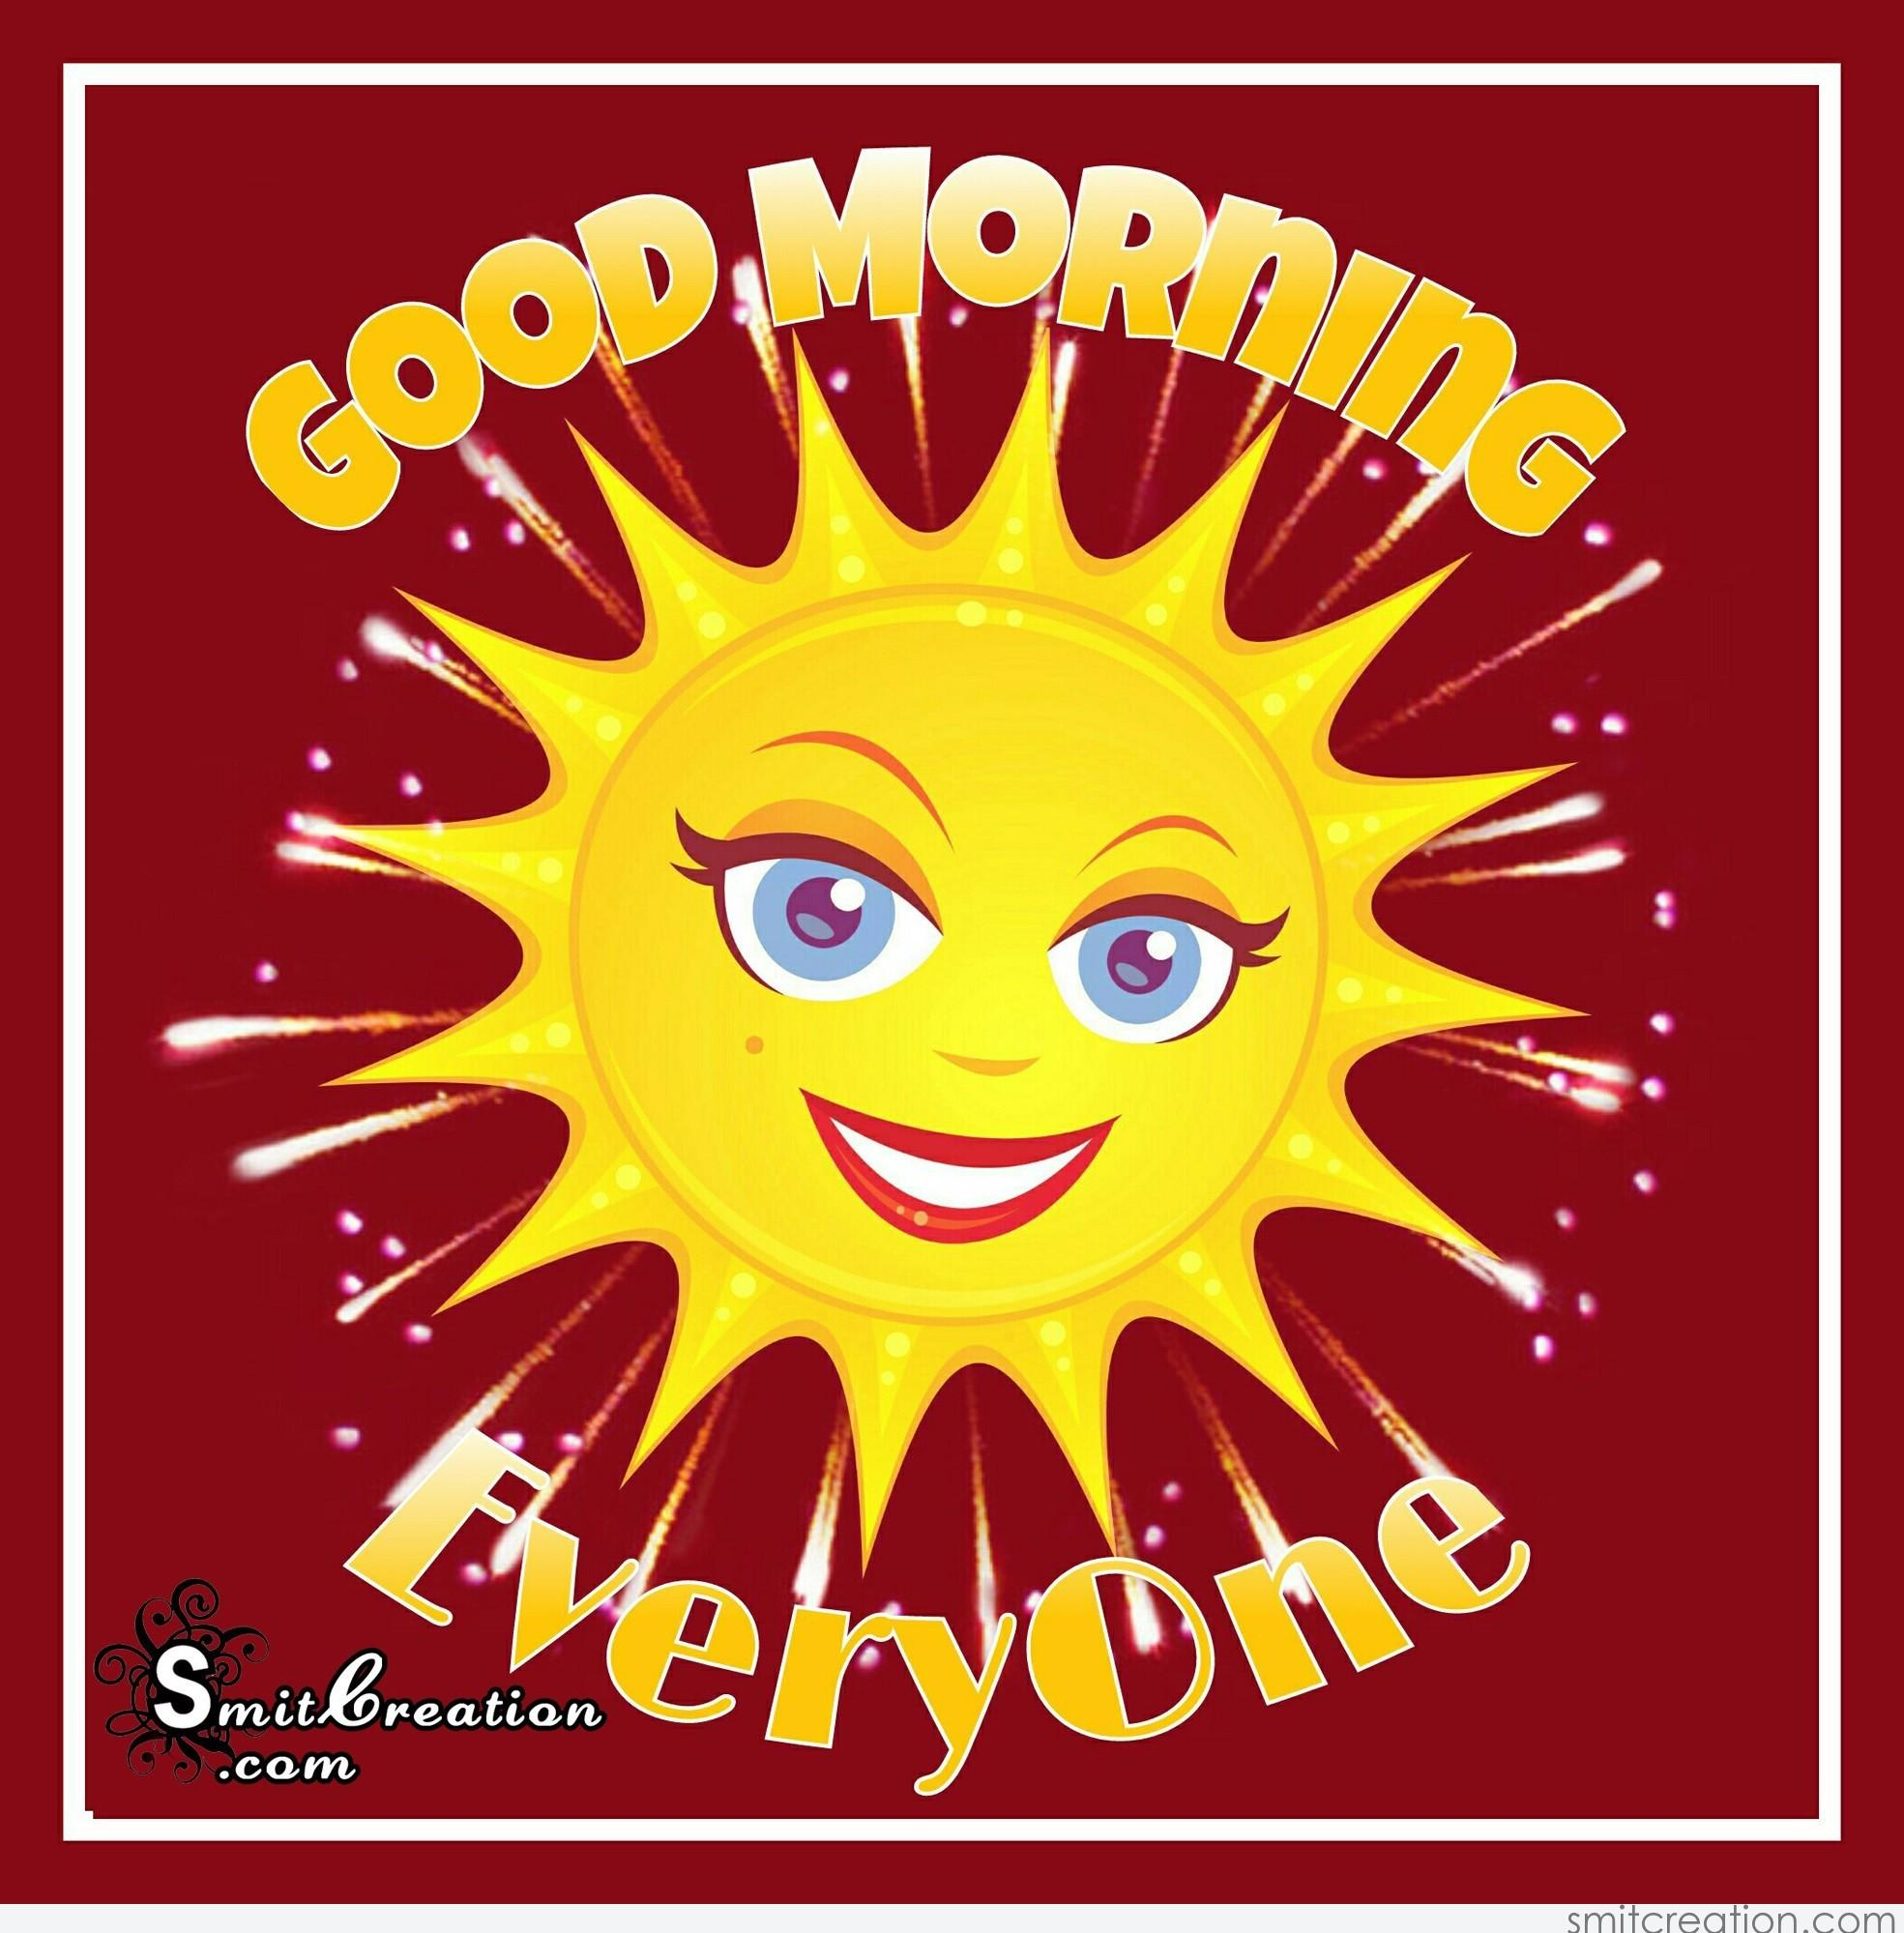 Good Morning To Everyone : Good morning everyone smitcreation